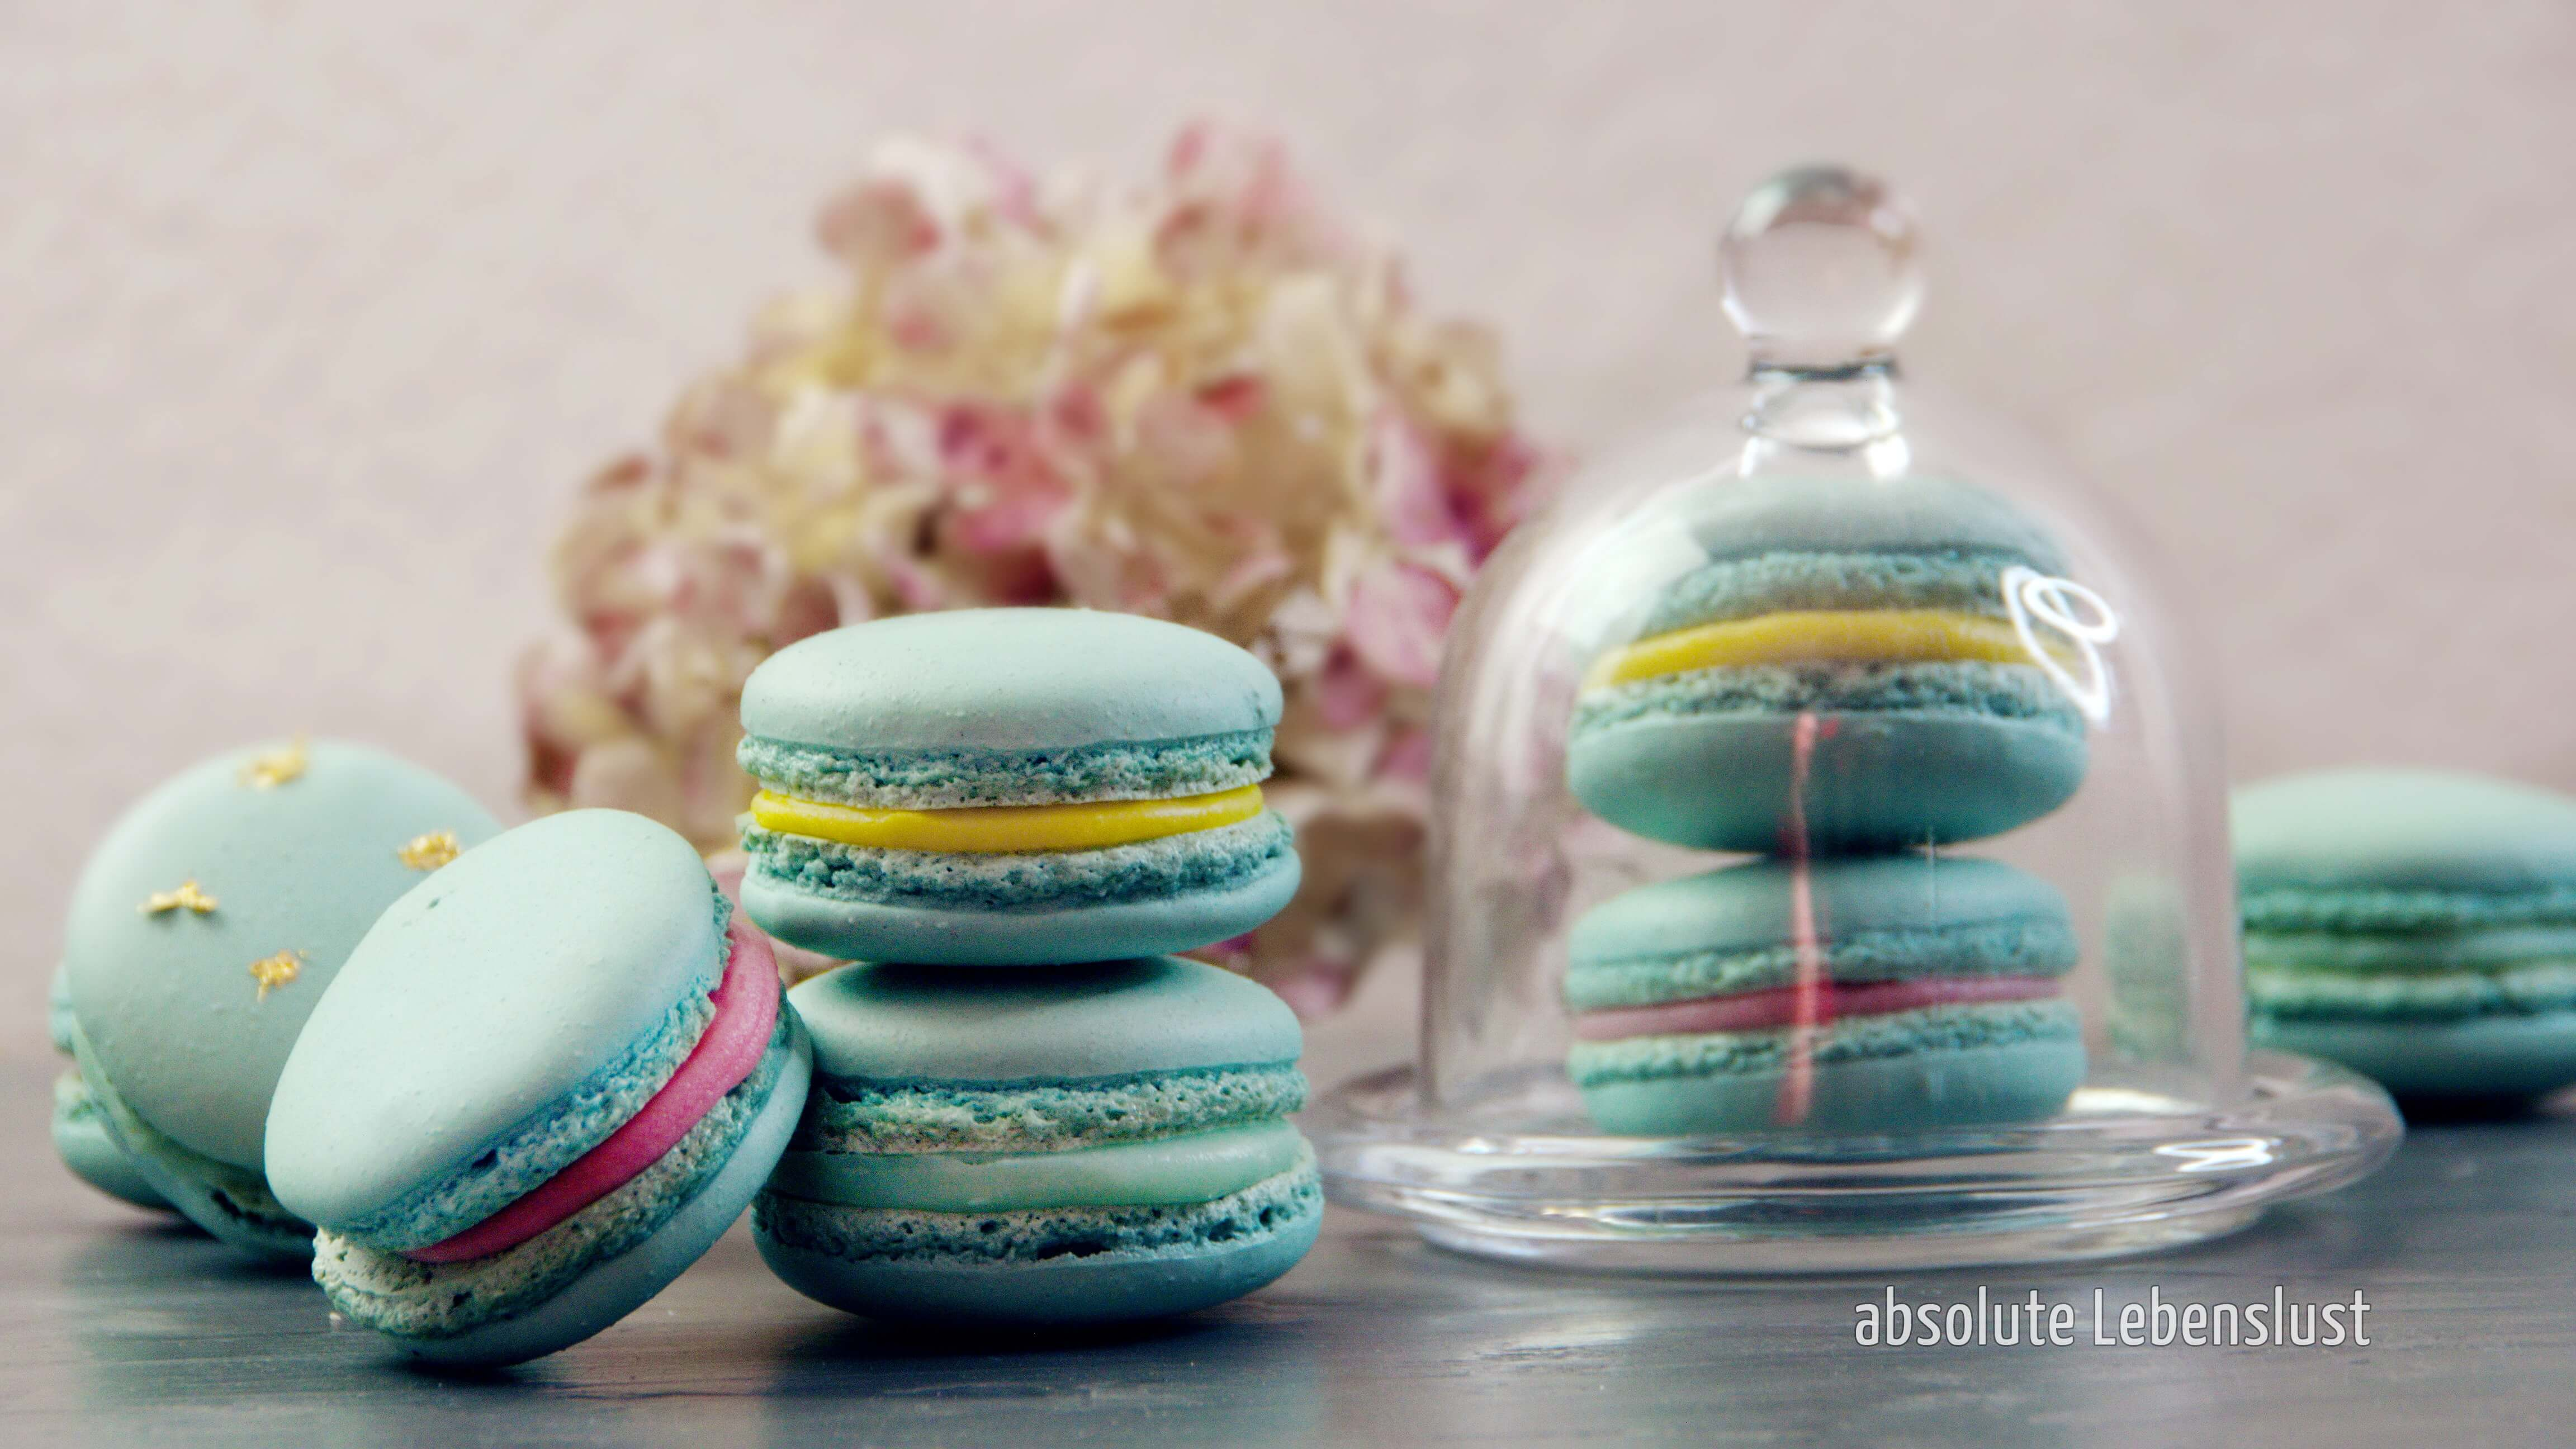 macarons rezept, macarons, selber machen, backen, füllung, deutsch, einfach, schnell